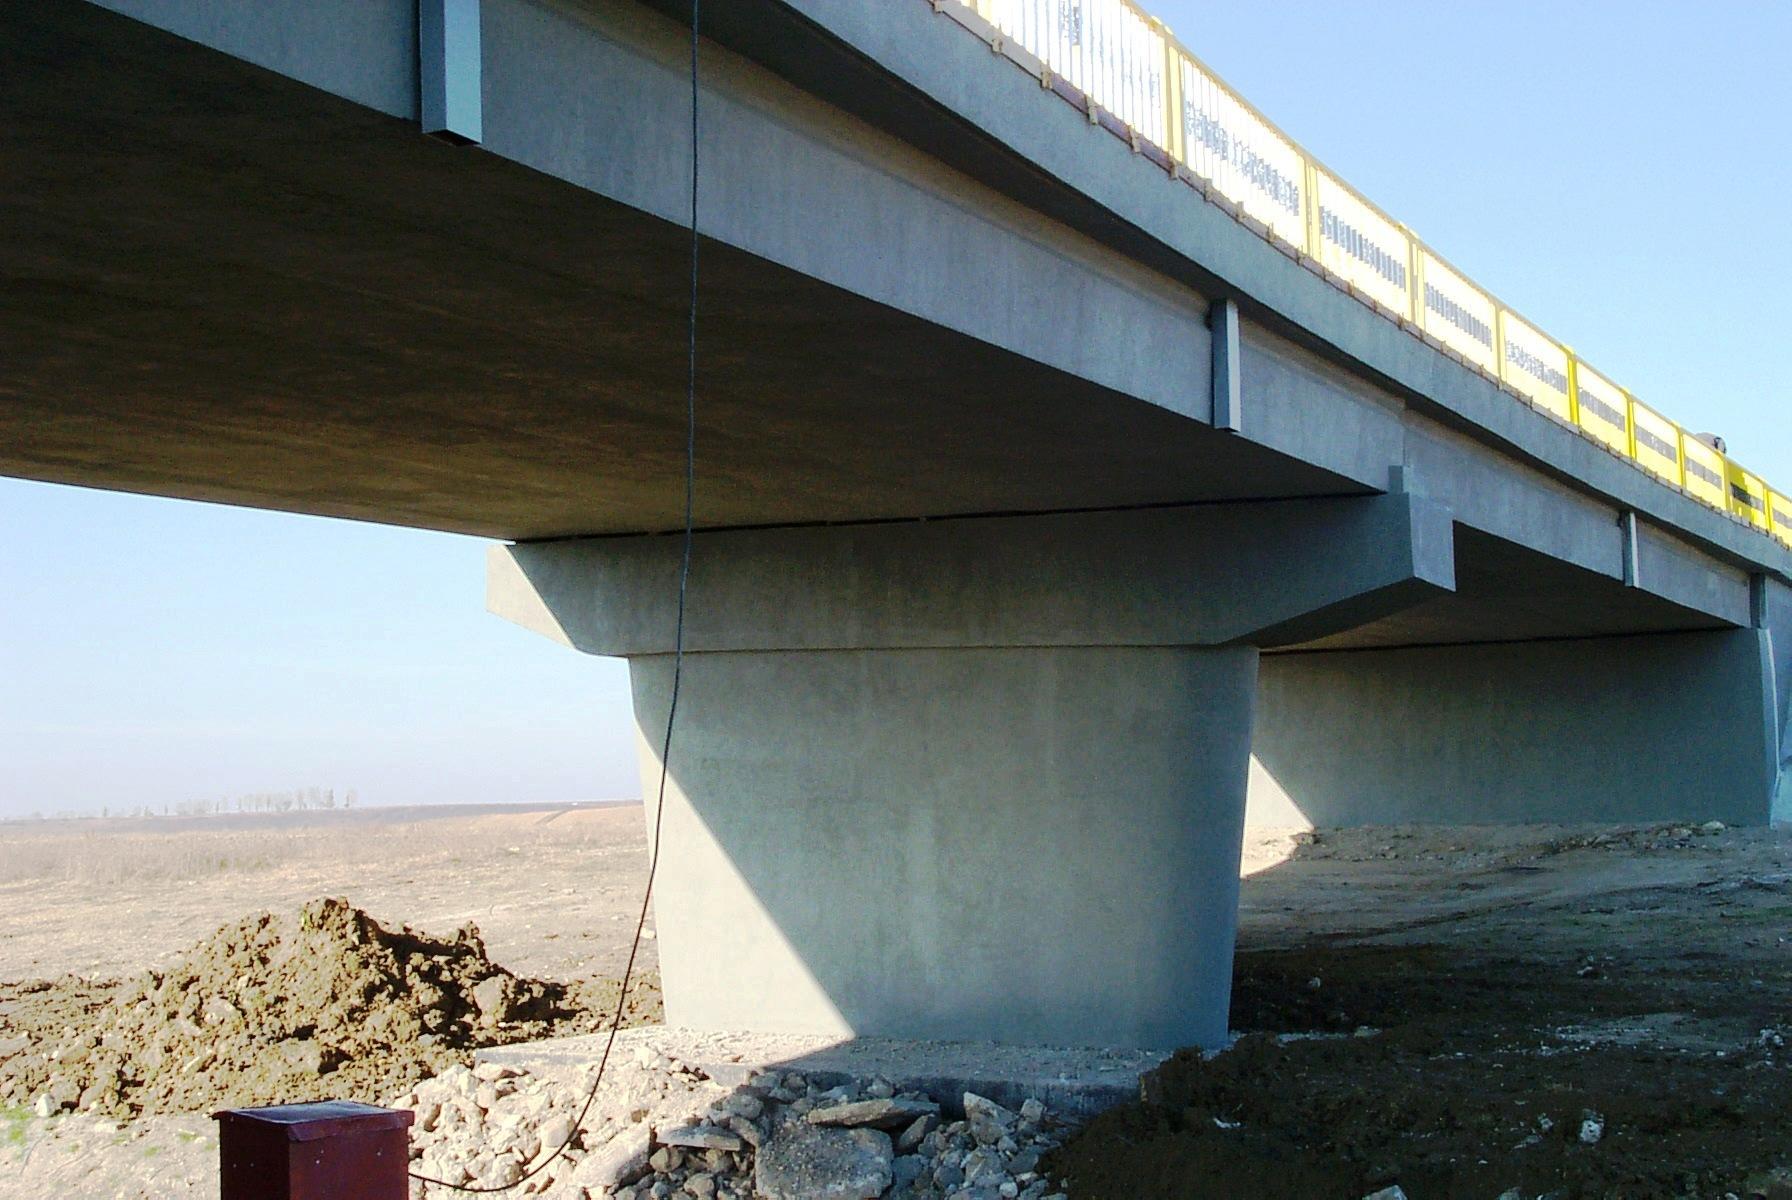 Reparatii pod (DN2), Km. 33 - 028, peste raul Calnistea MAPEI - Poza 22